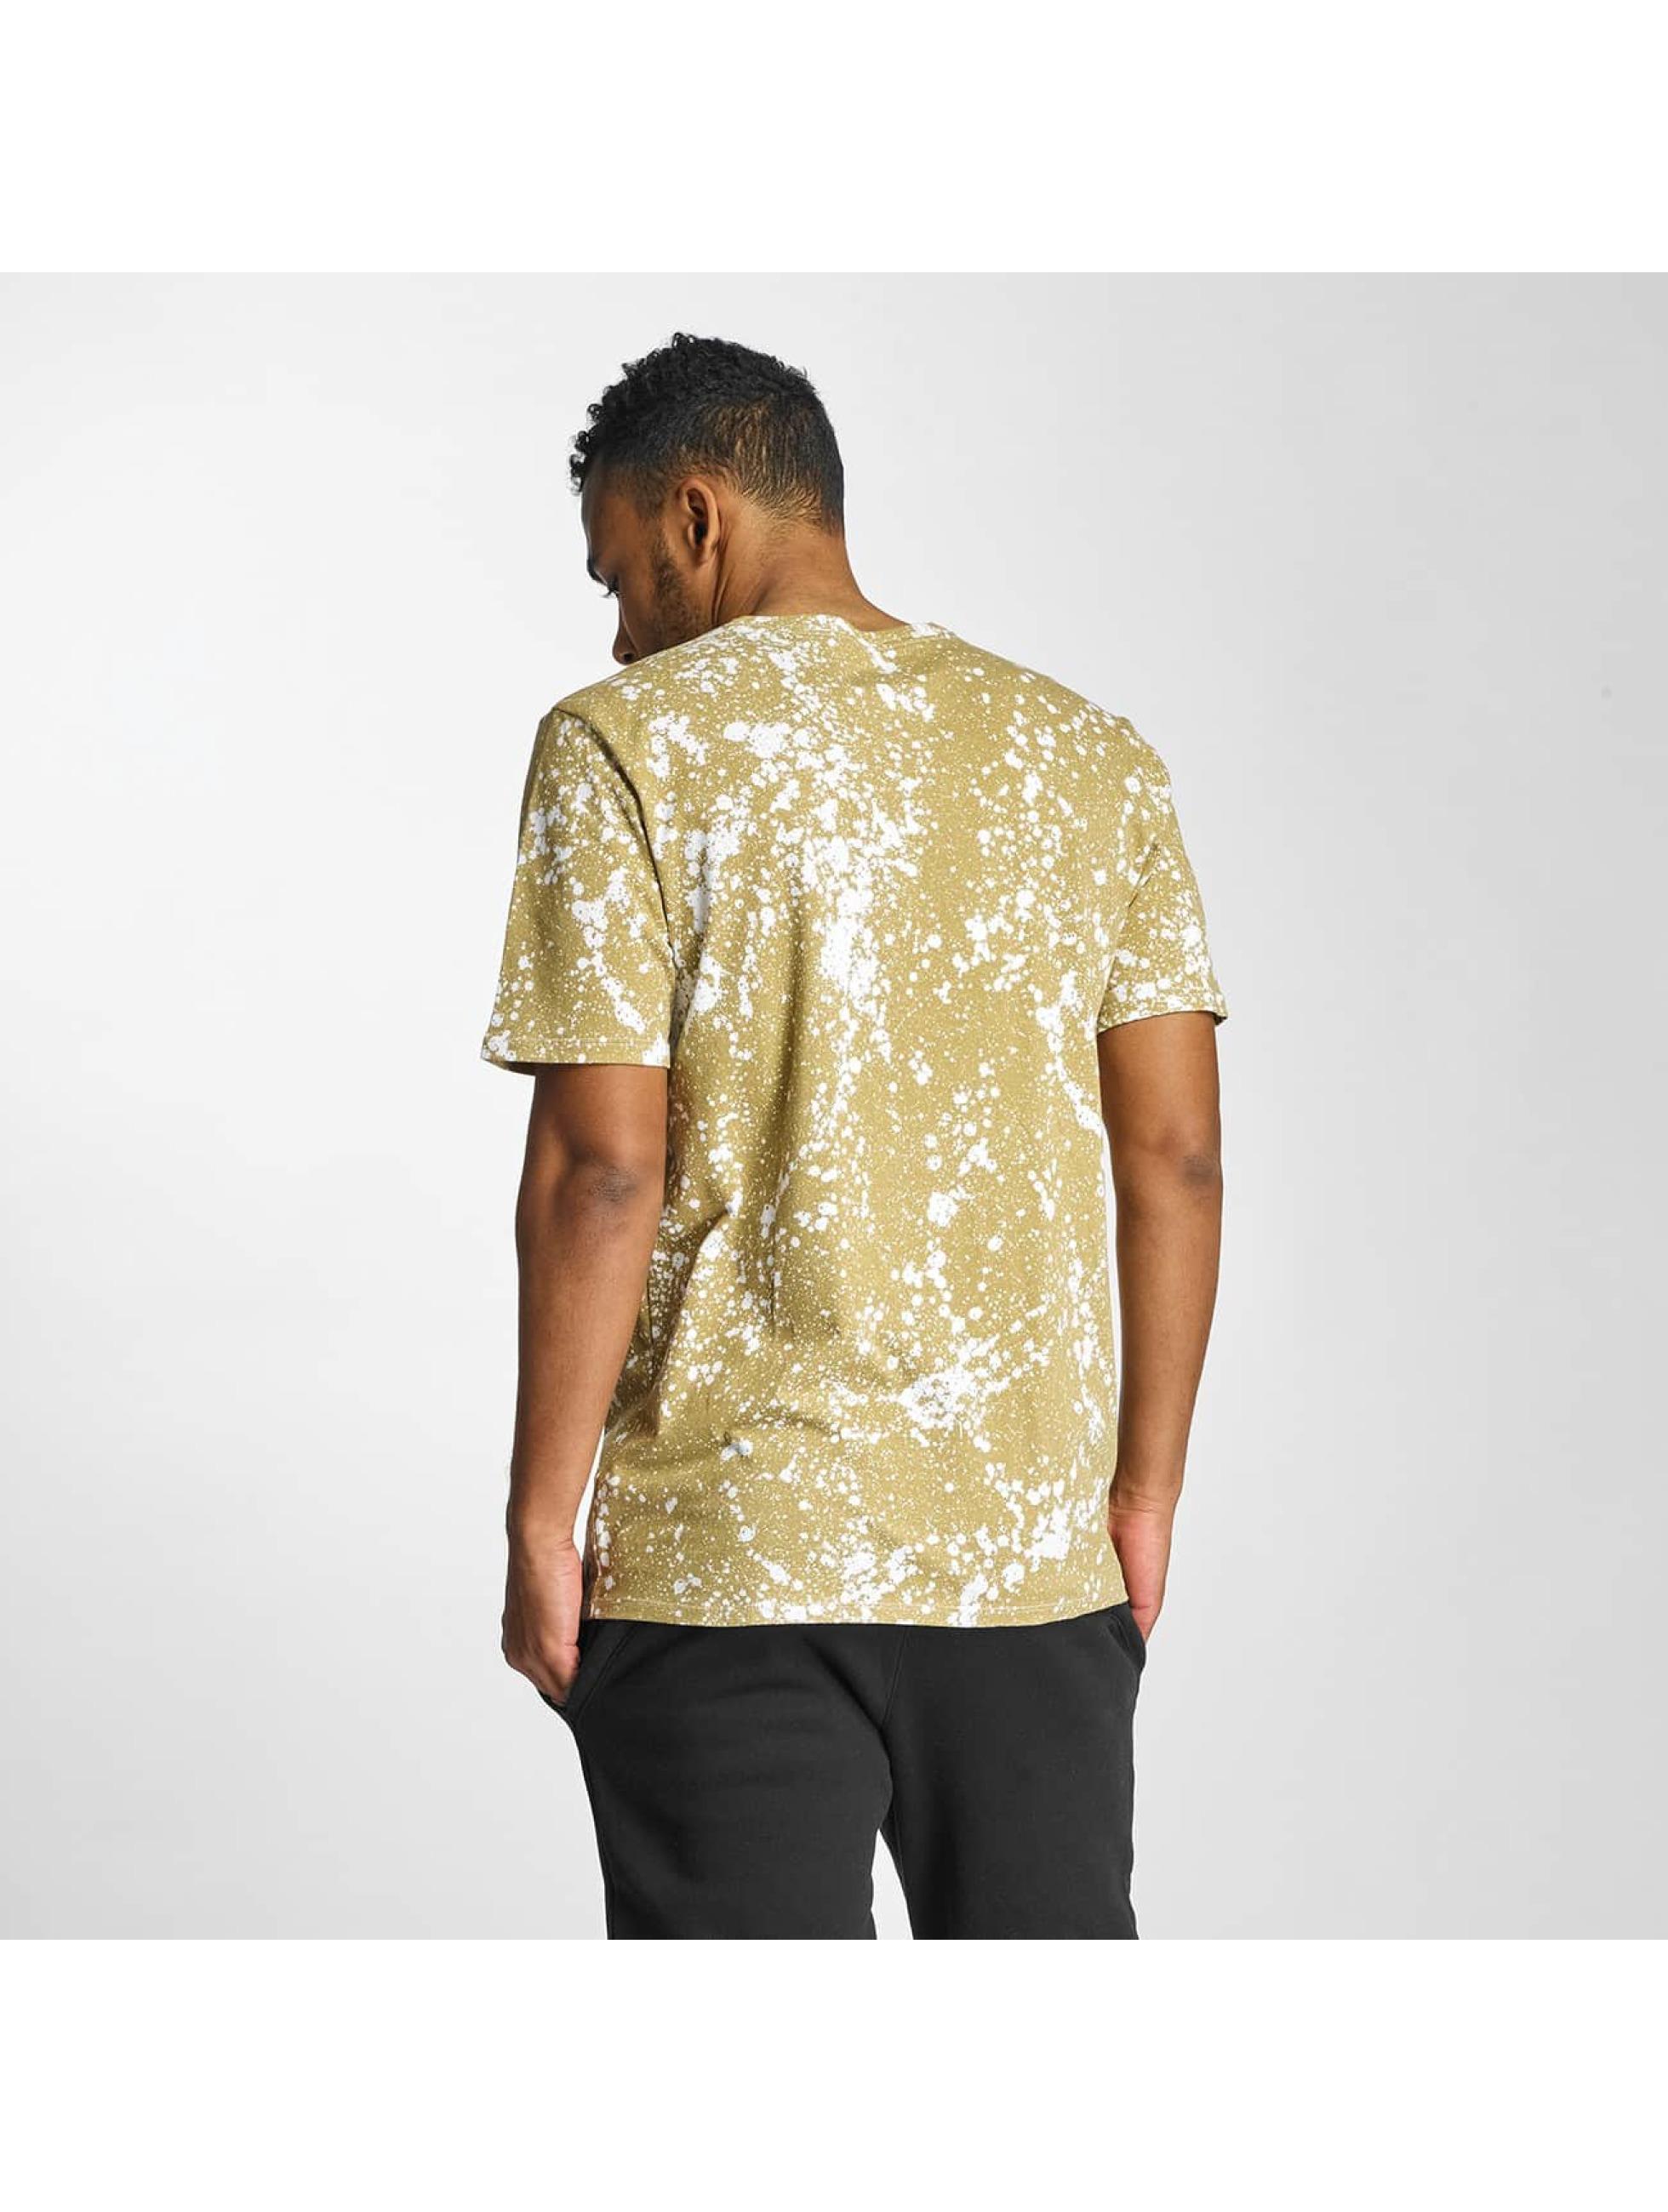 Nike T-Shirt NSW Ultra Splatter Print khaki